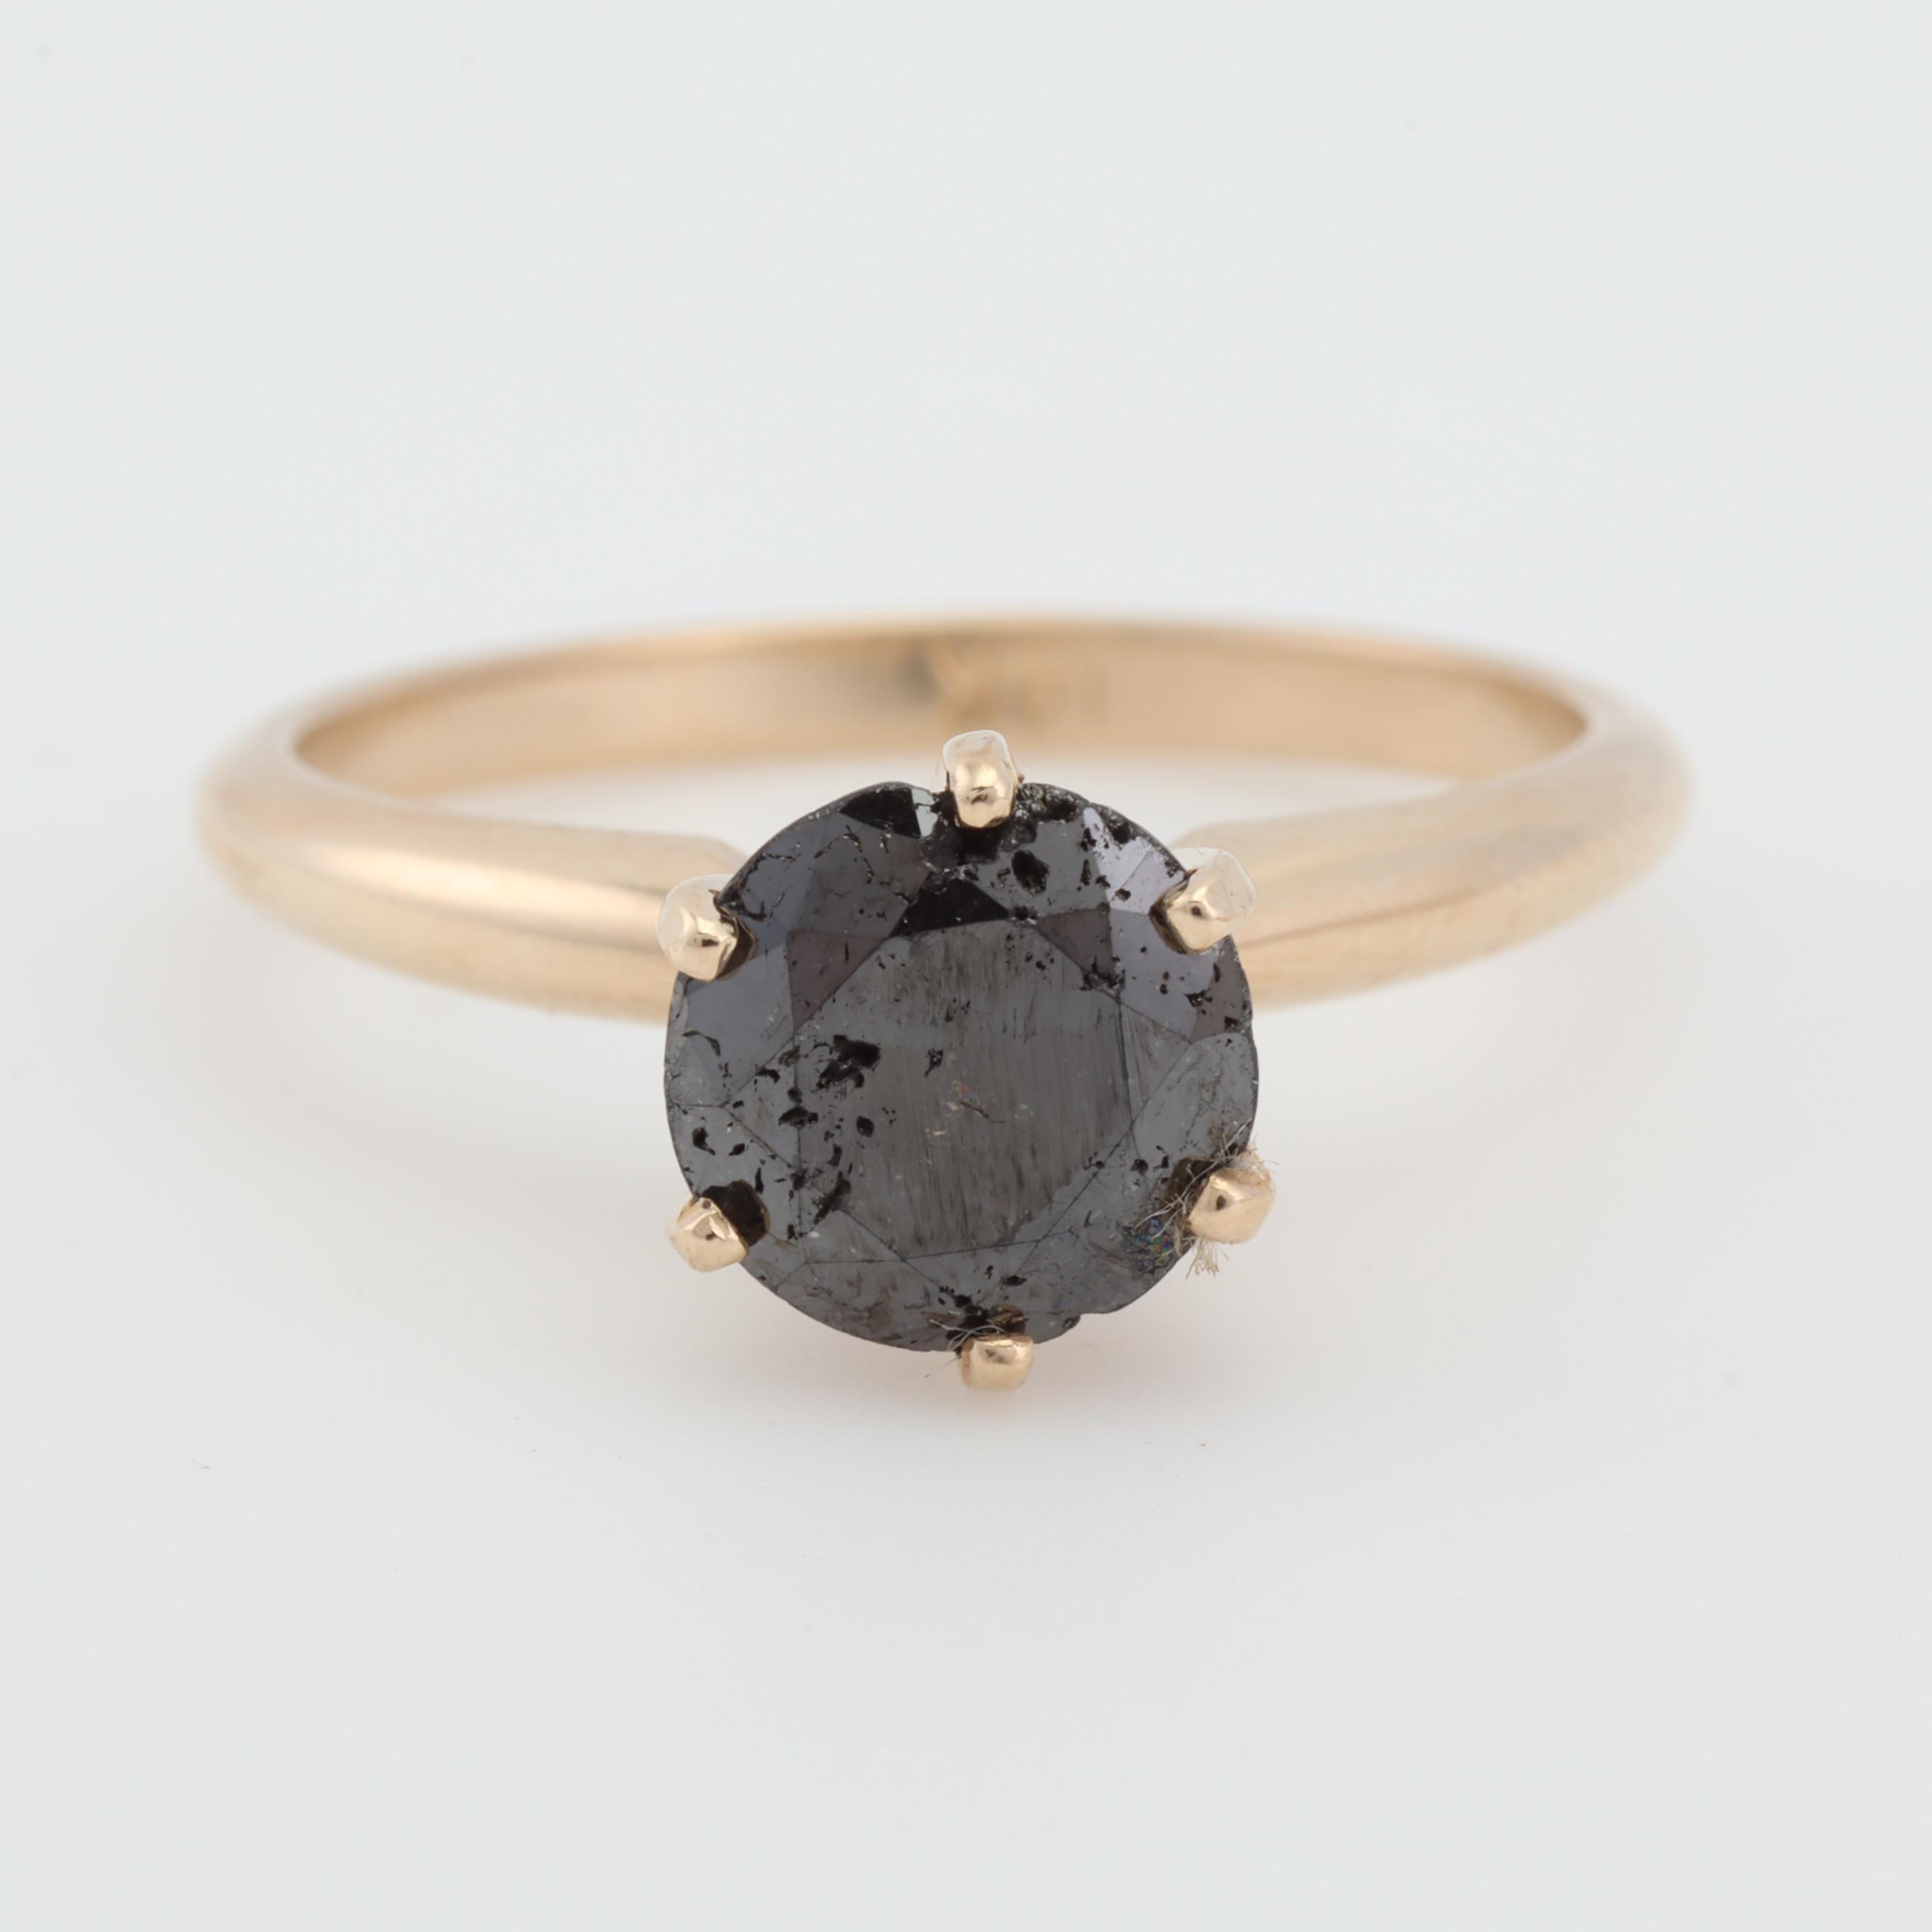 14K Yellow Gold Black Diamond Solitaire Ring, 1.20 CT